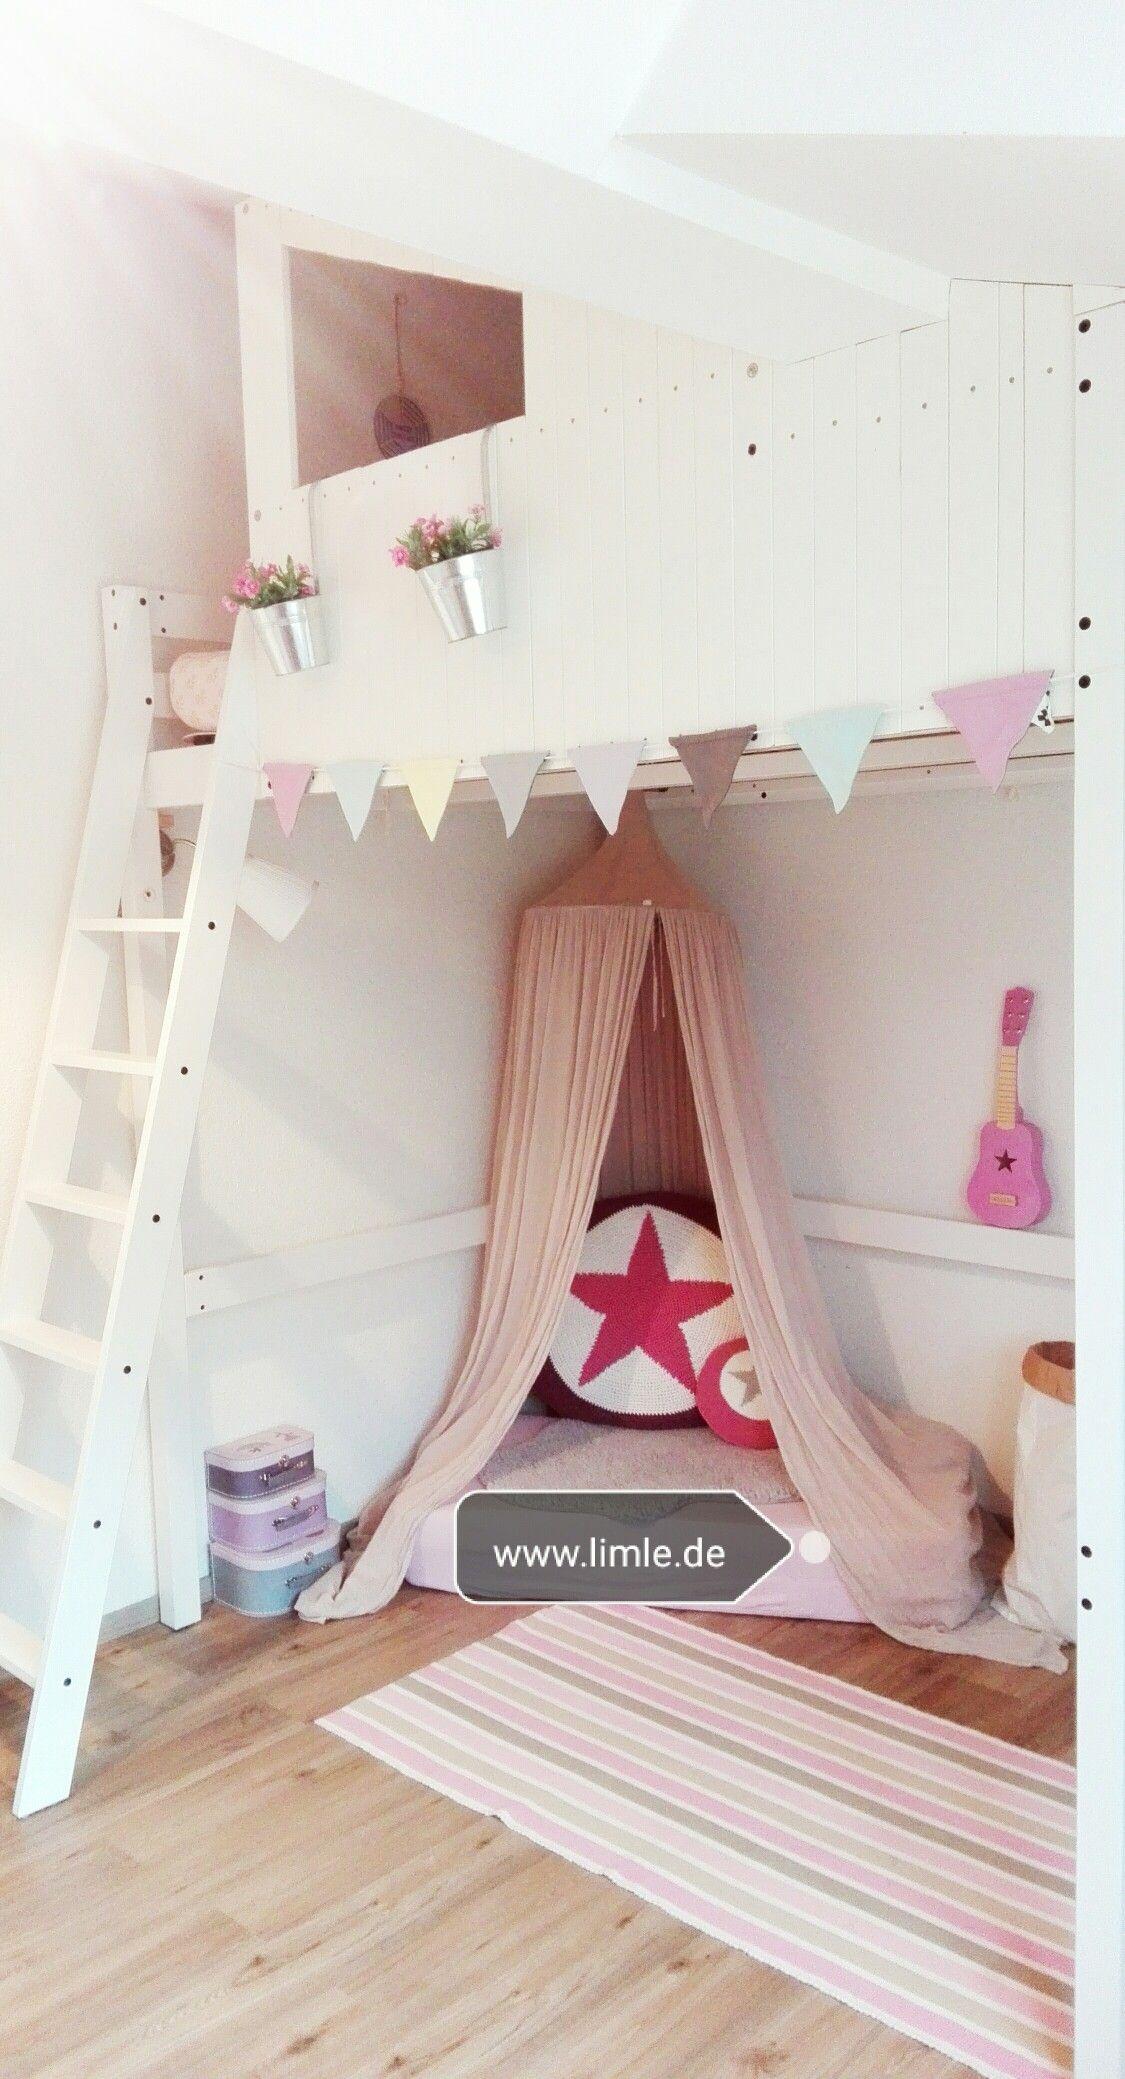 Full Size of Hochbetten Kinderzimmer Ikeahack Diy Deko Mdchen Hochbett Regal Weiß Sofa Regale Kinderzimmer Hochbetten Kinderzimmer